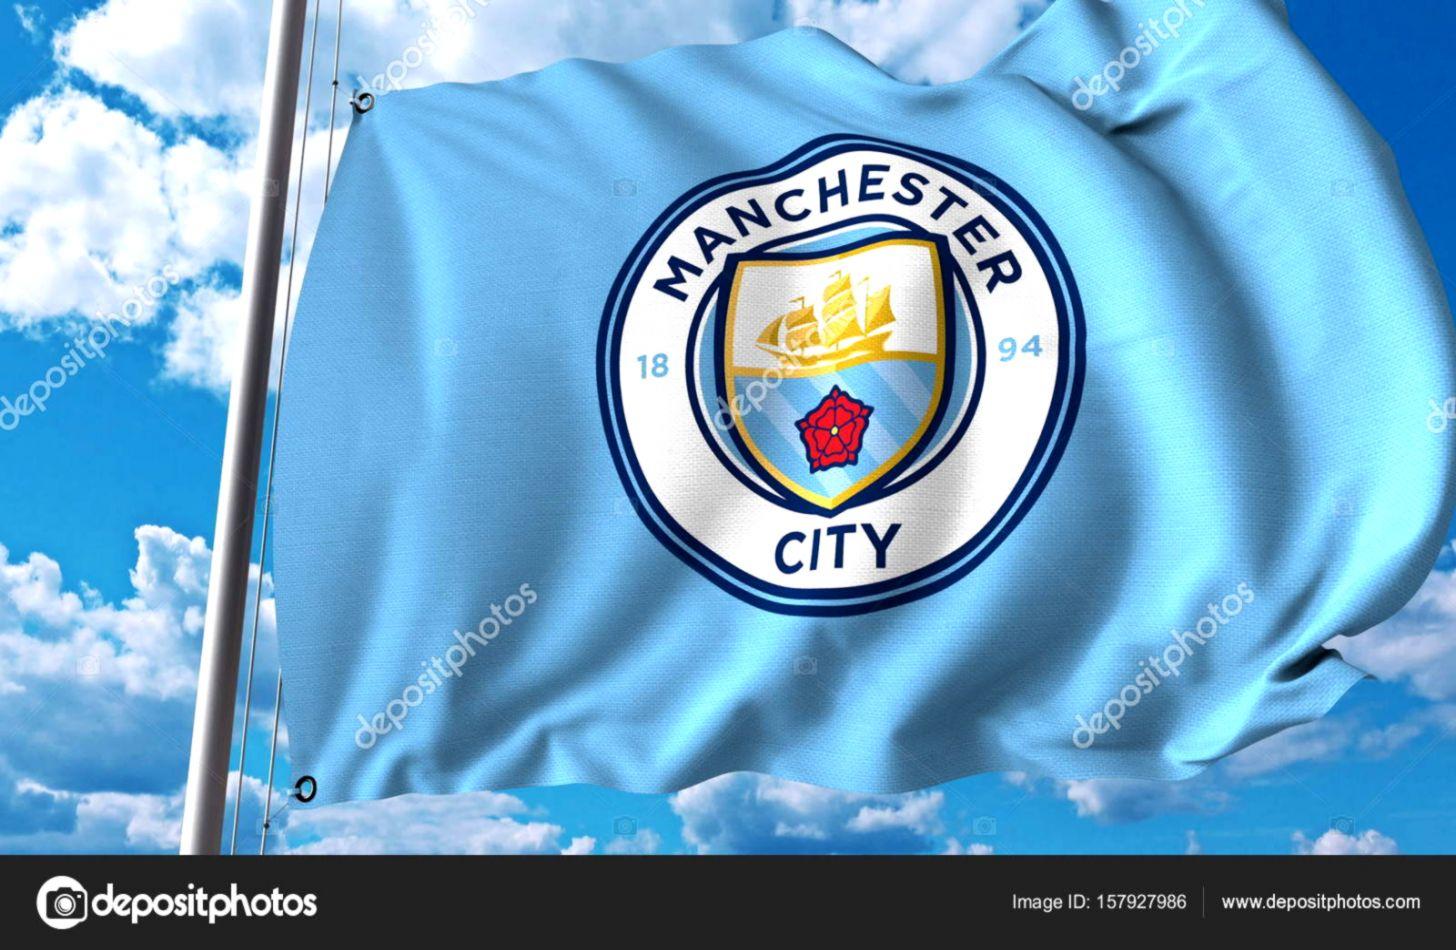 Waving Flag With Manchester City Football Team Logo Amway Logo 1456x950 Wallpaper Teahub Io